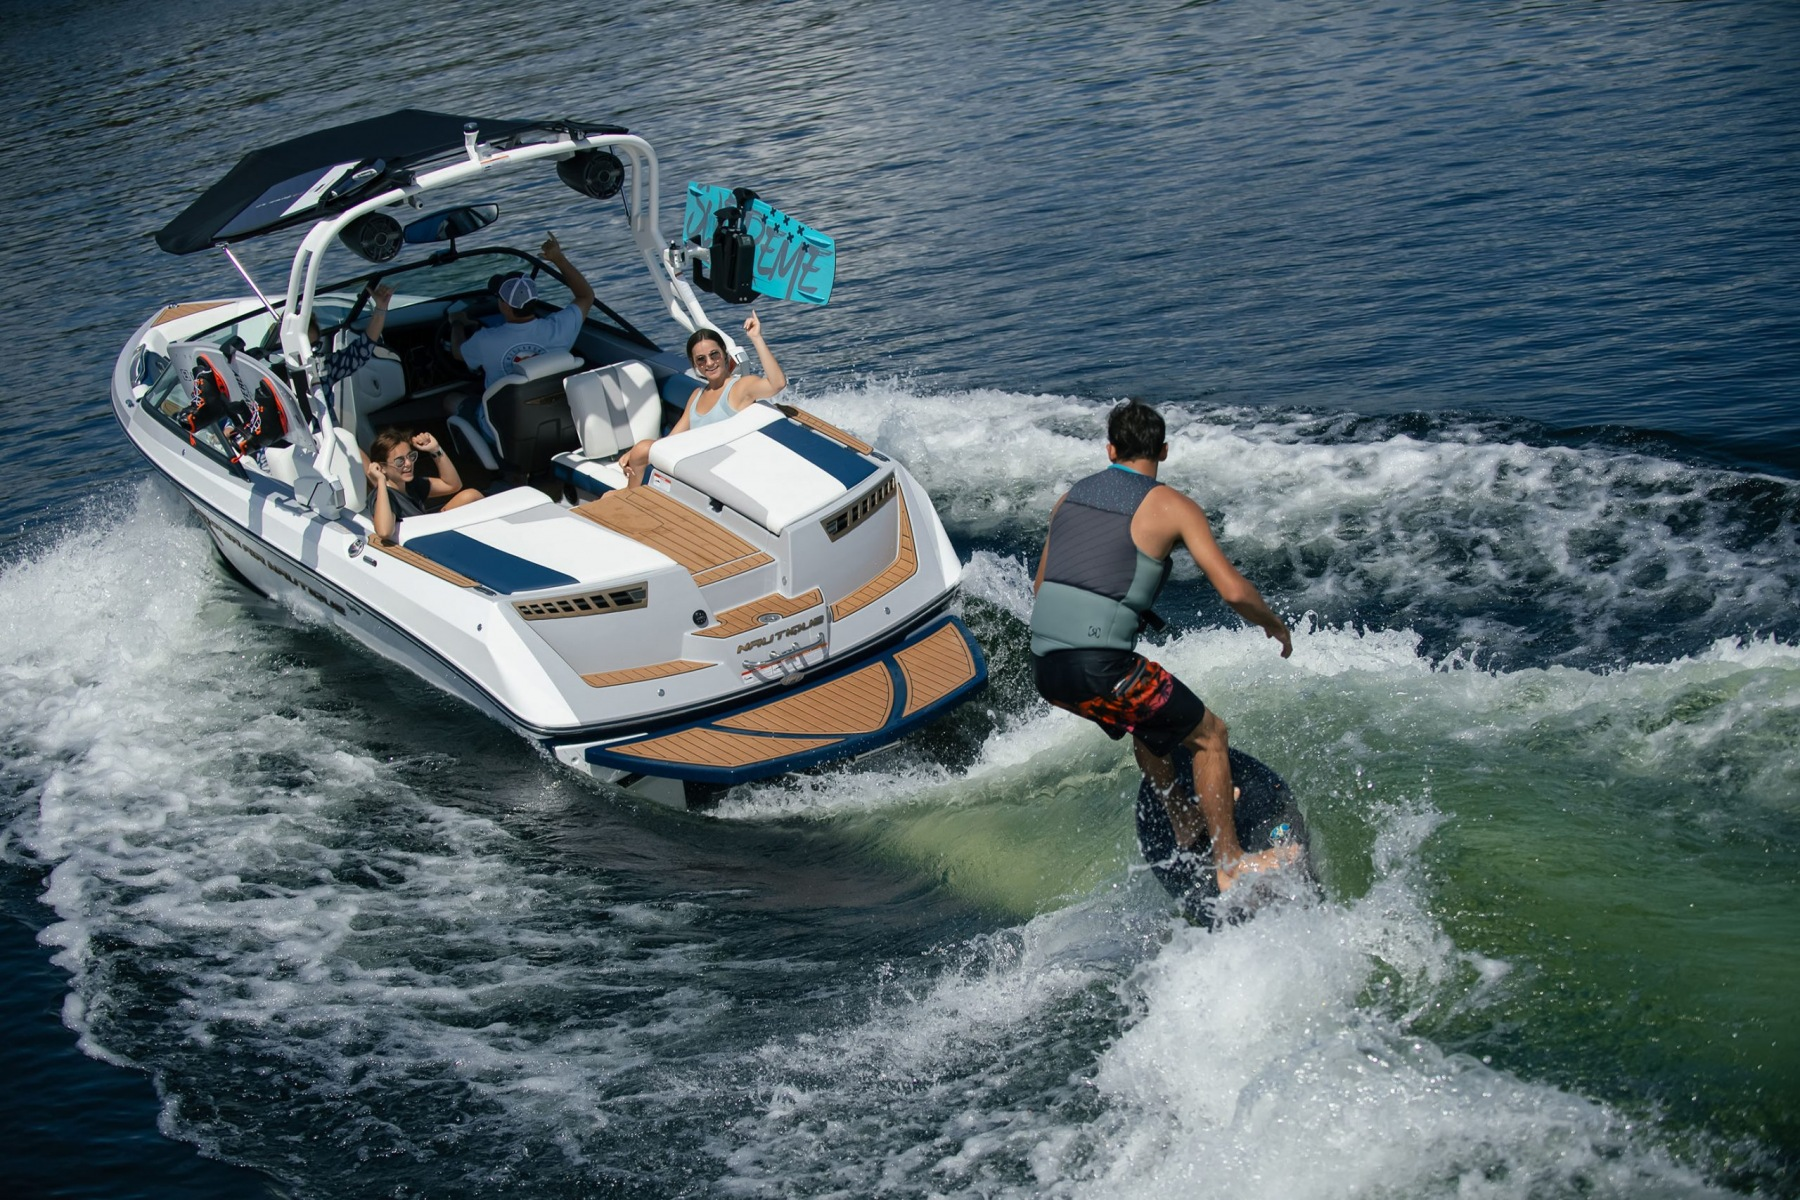 Wake Surfing Behind the 2022 Nautique 210 Wake Boat